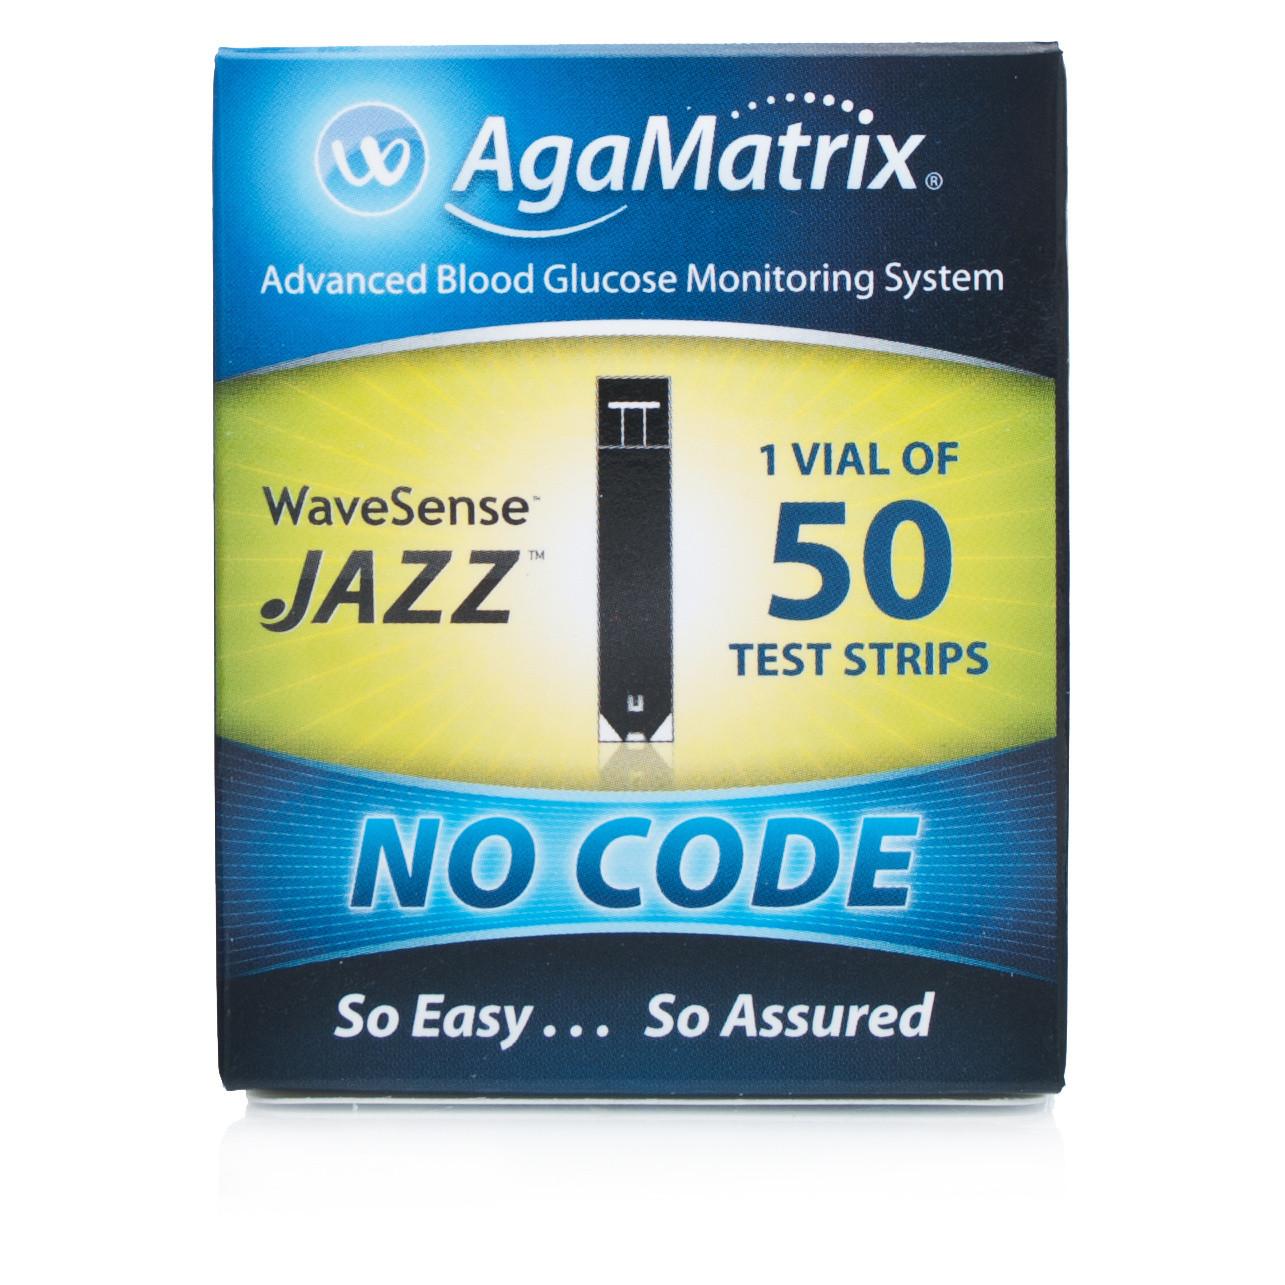 WaveSense Jazz Diabetes Test Strips